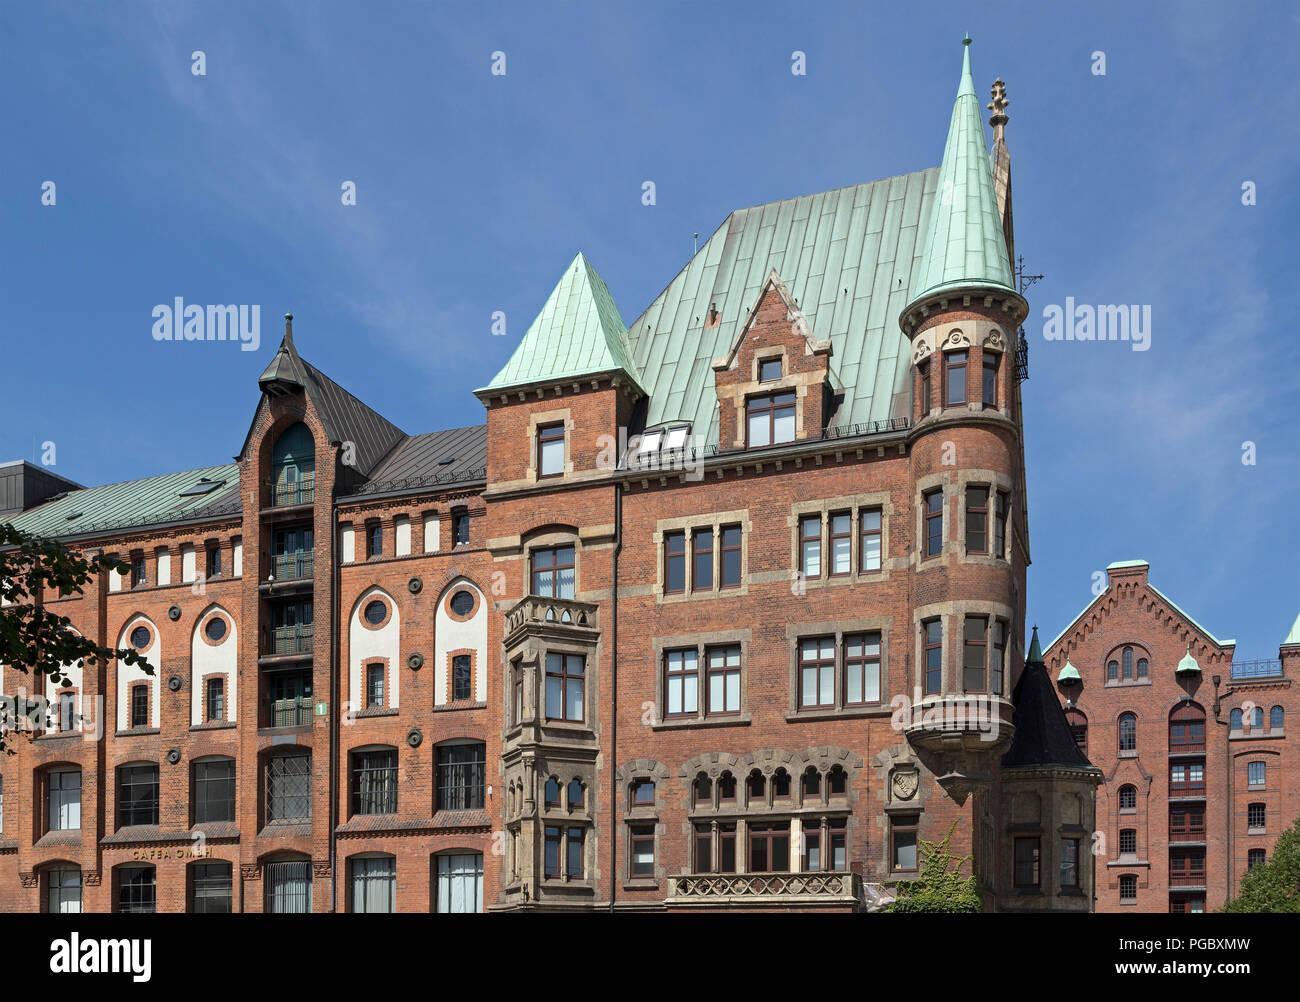 old buildings, Speicherstadt (warehouse district), Hamburg, Germany - Stock Image